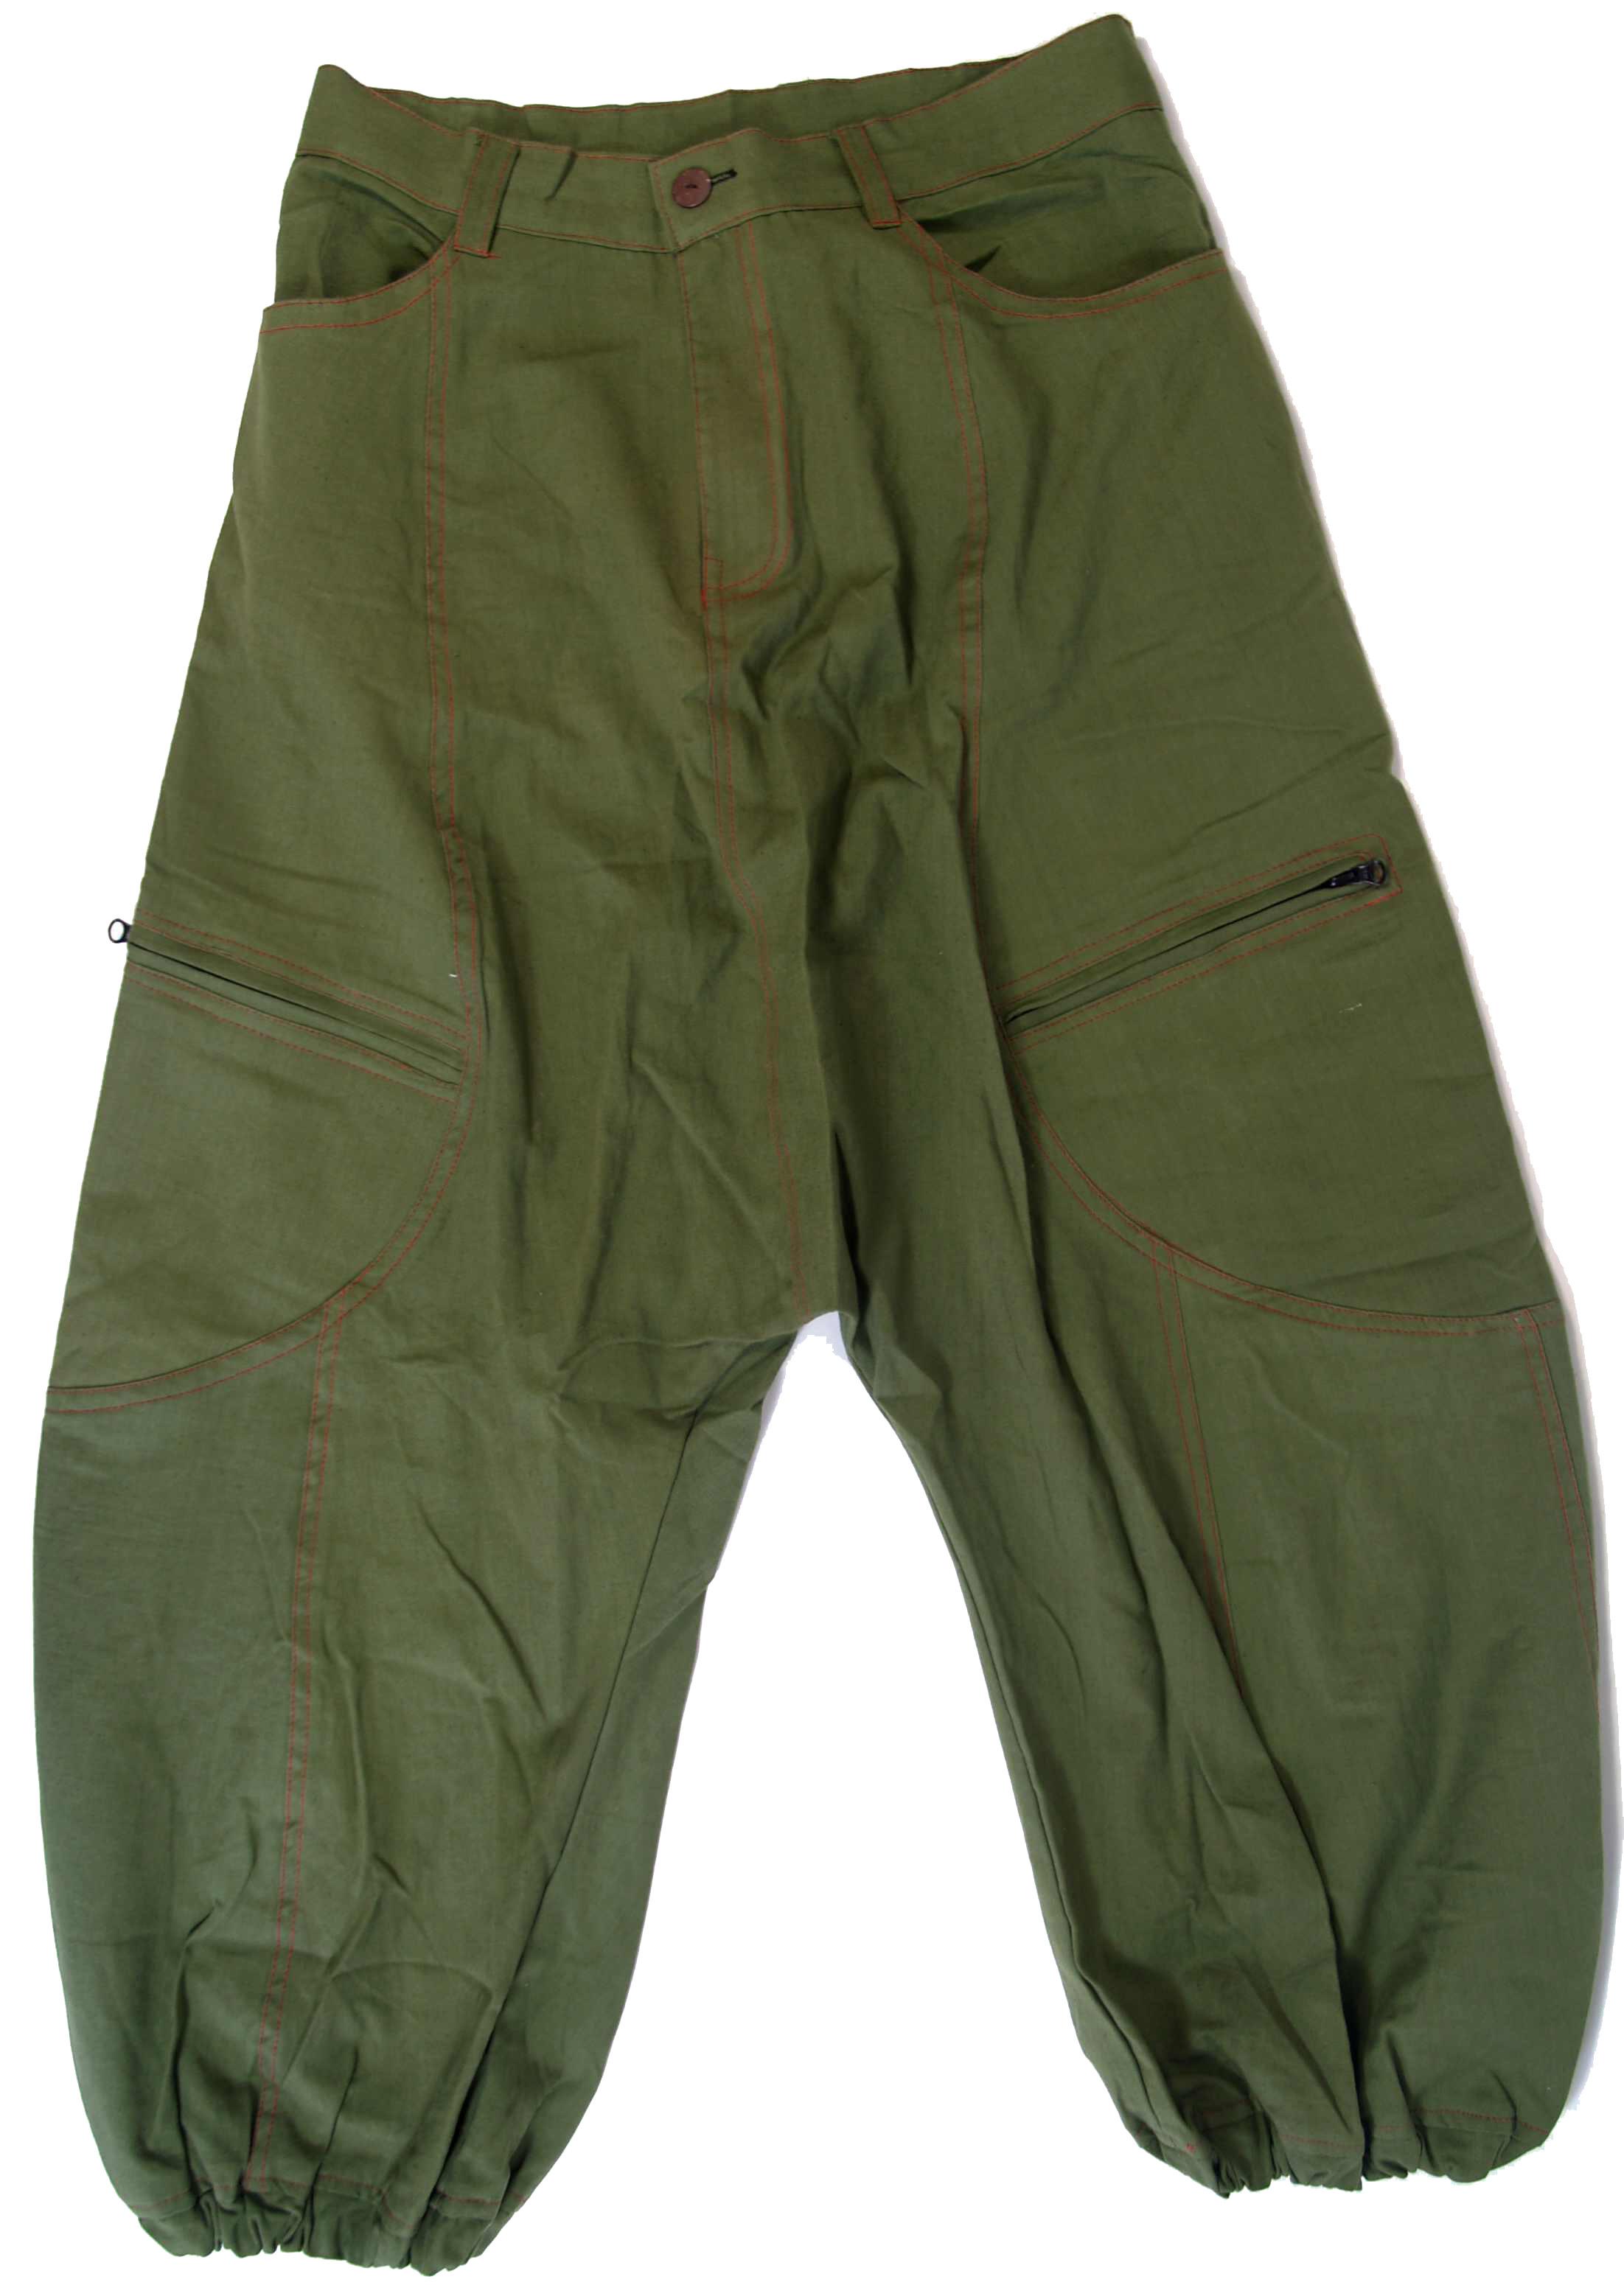 Guru Shop De harem trousers harem trousers bloomers trousers olive green